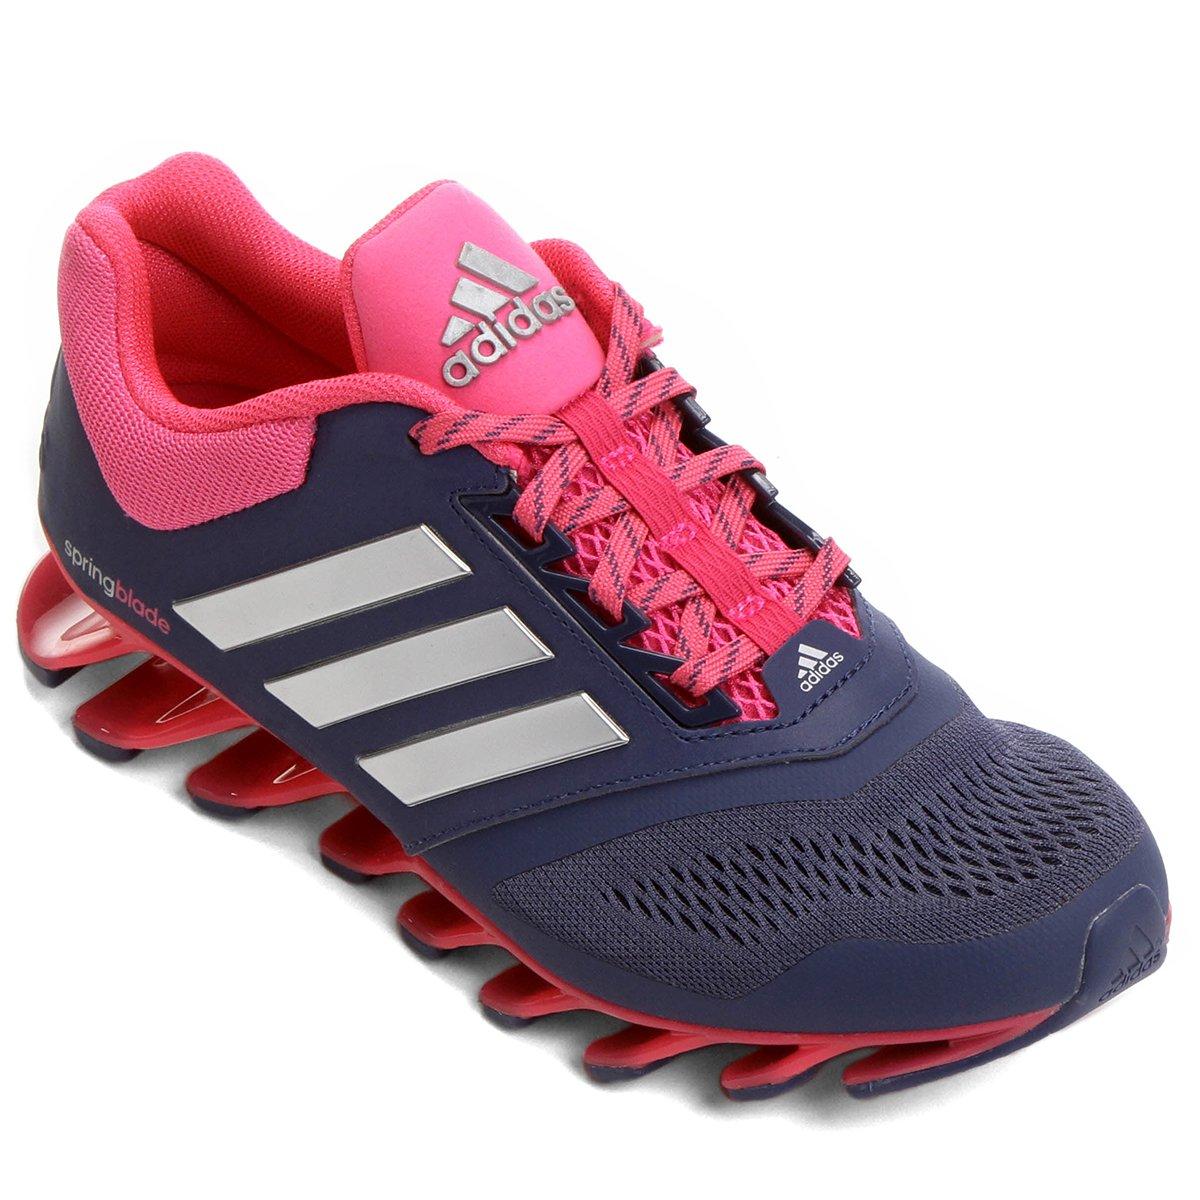 ... denmark tênis adidas springblade drive 3 feminino roxorosa 7ba63 43ae2 c1320049cdb6c